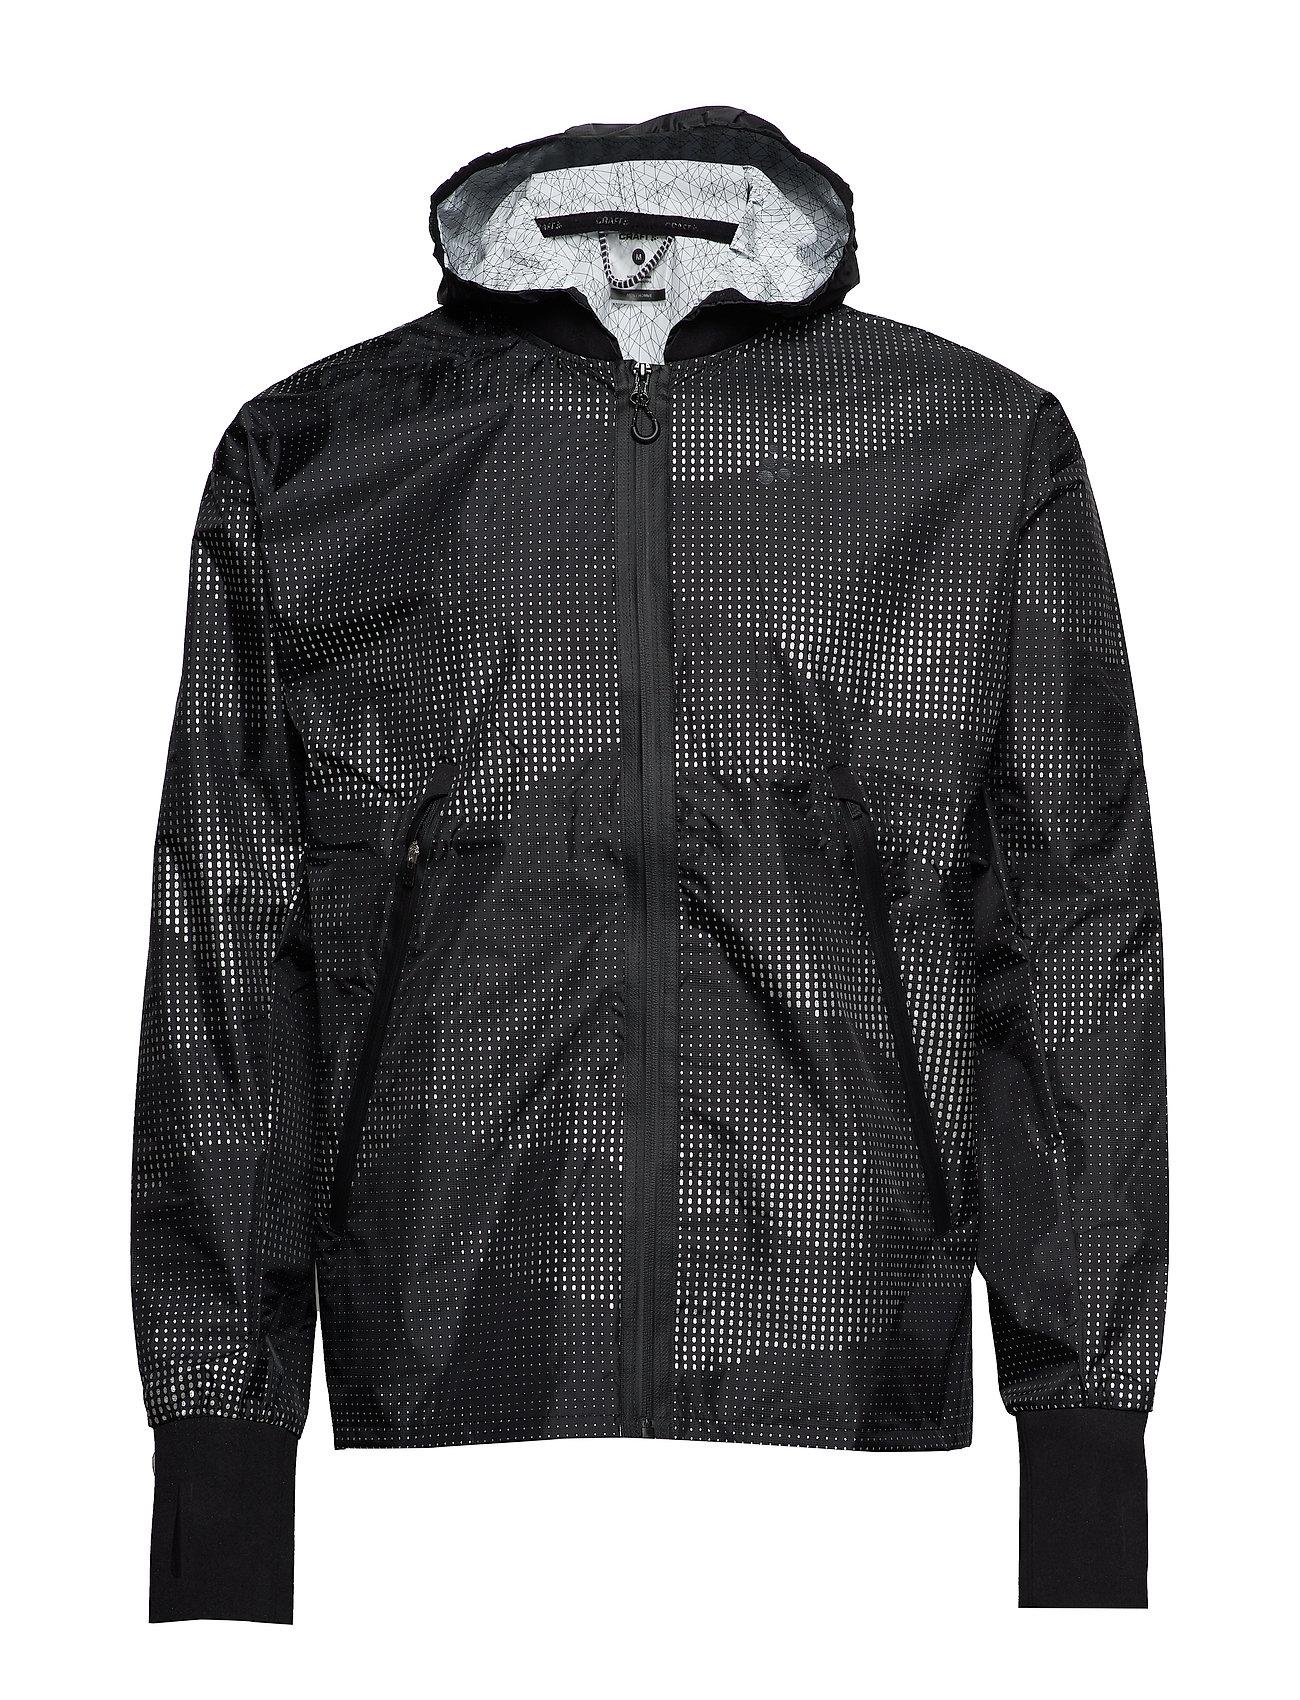 Craft NORDIC LIGHT JKT M - BLACK